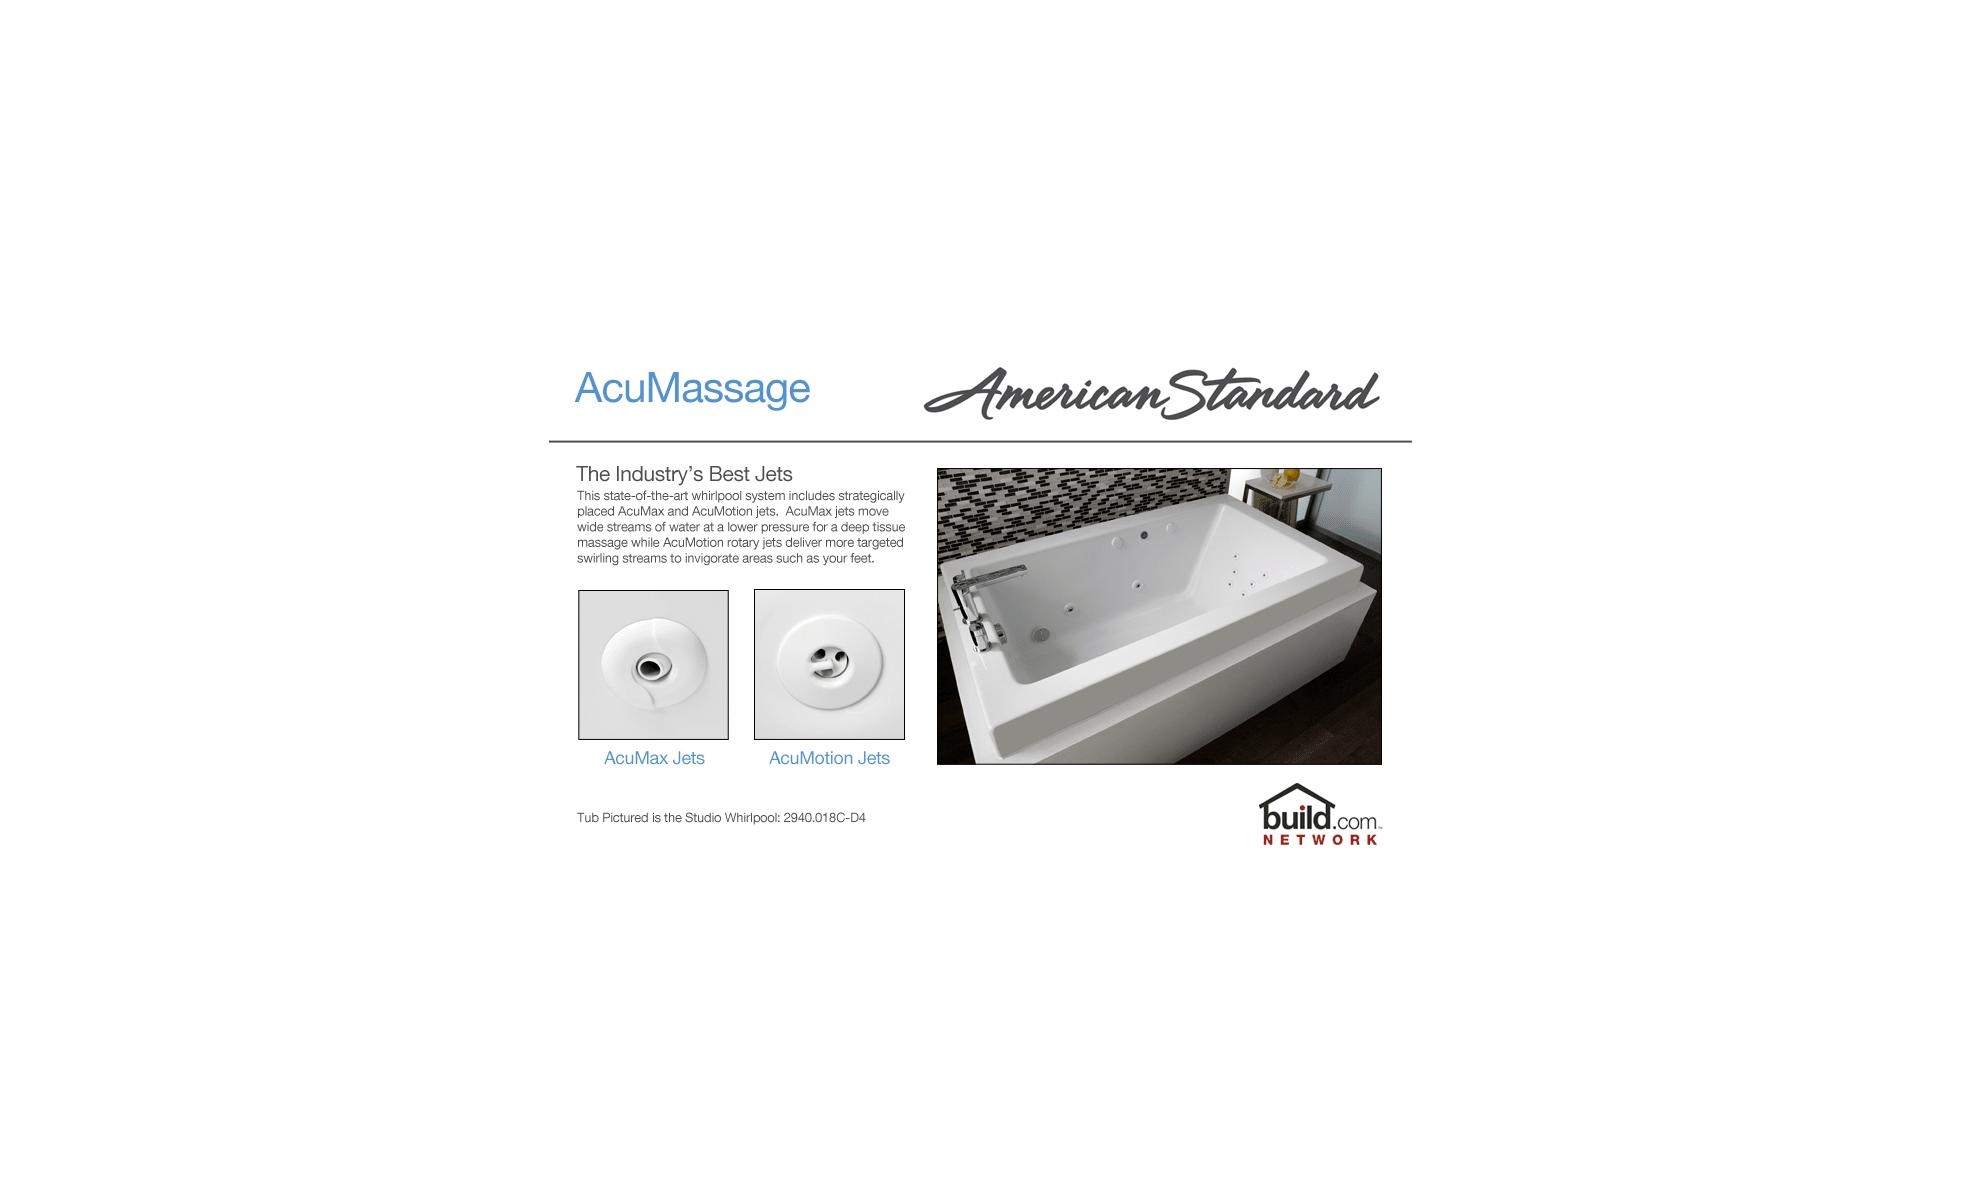 American Standard Everclean Bathtub Jet | www.topsimages.com